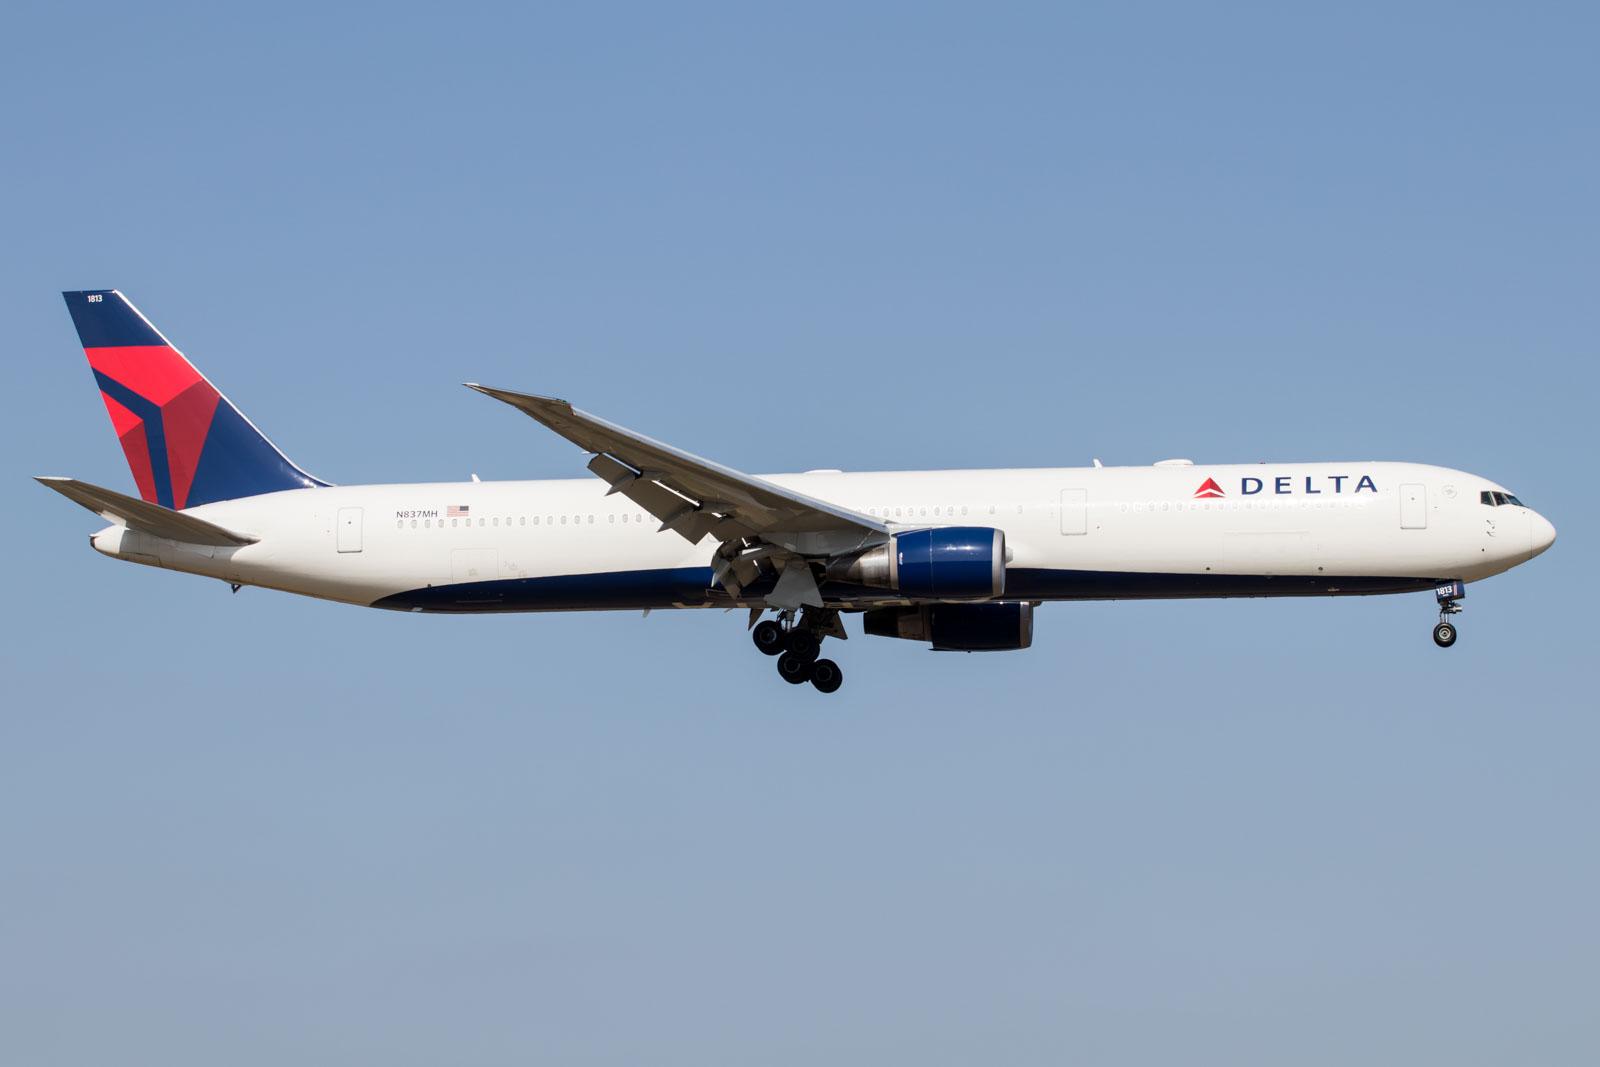 Delta Air Lines Boeing 767-400ER at Tokyo Narita